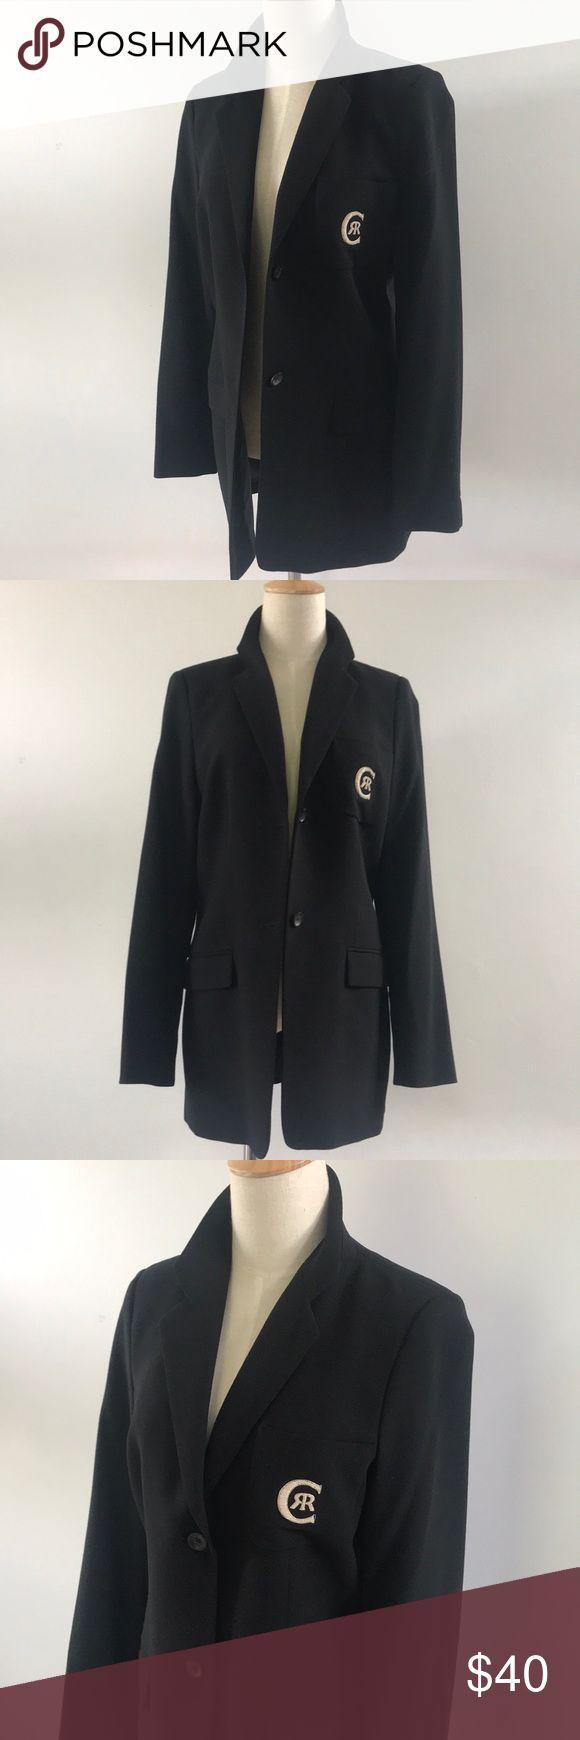 Vintage monogrammed wool blazer 100 percent virgin wool excellent vintage condition double button blazer Cerruti 1881 Jackets & Coats Blazers